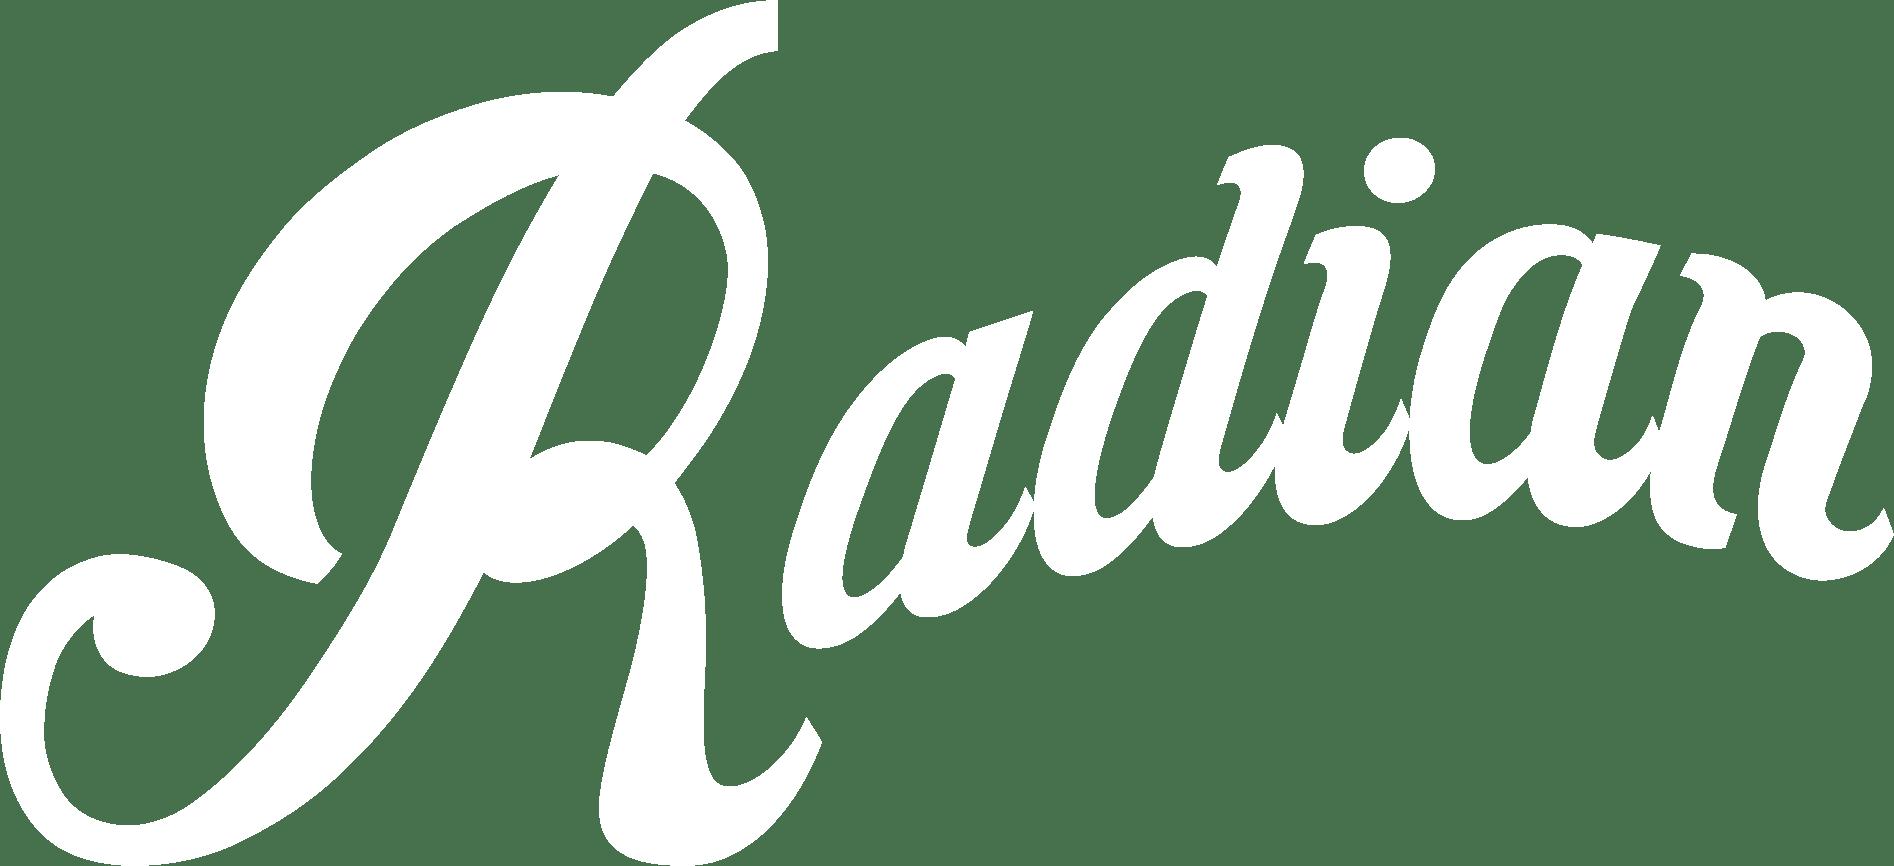 RADIAN BLOG